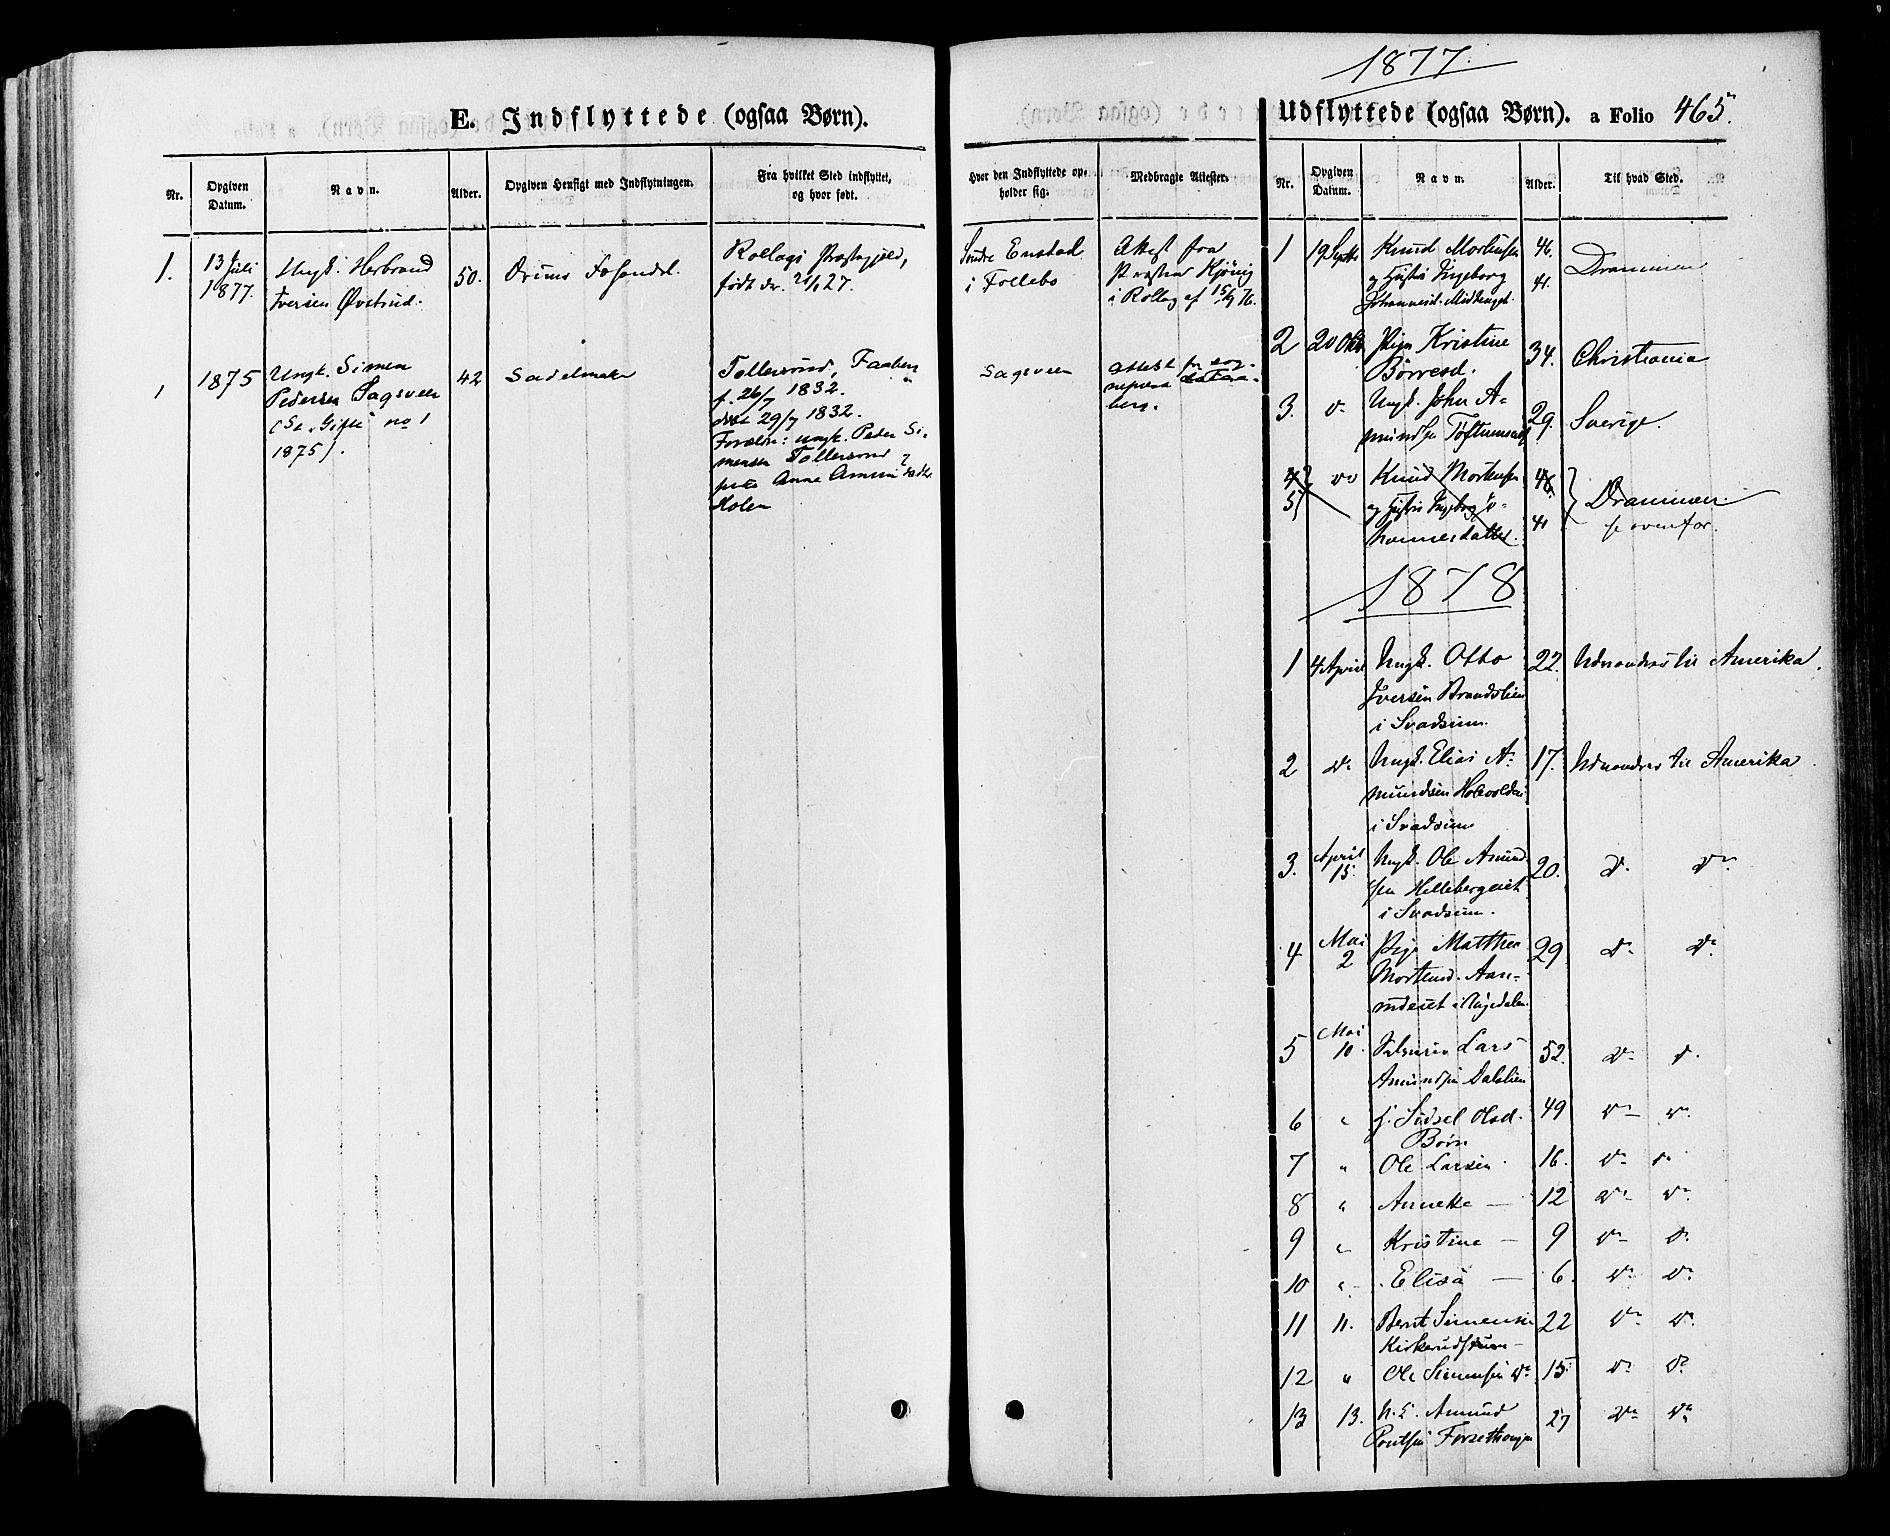 SAH, Gausdal prestekontor, Ministerialbok nr. 10, 1867-1886, s. 465